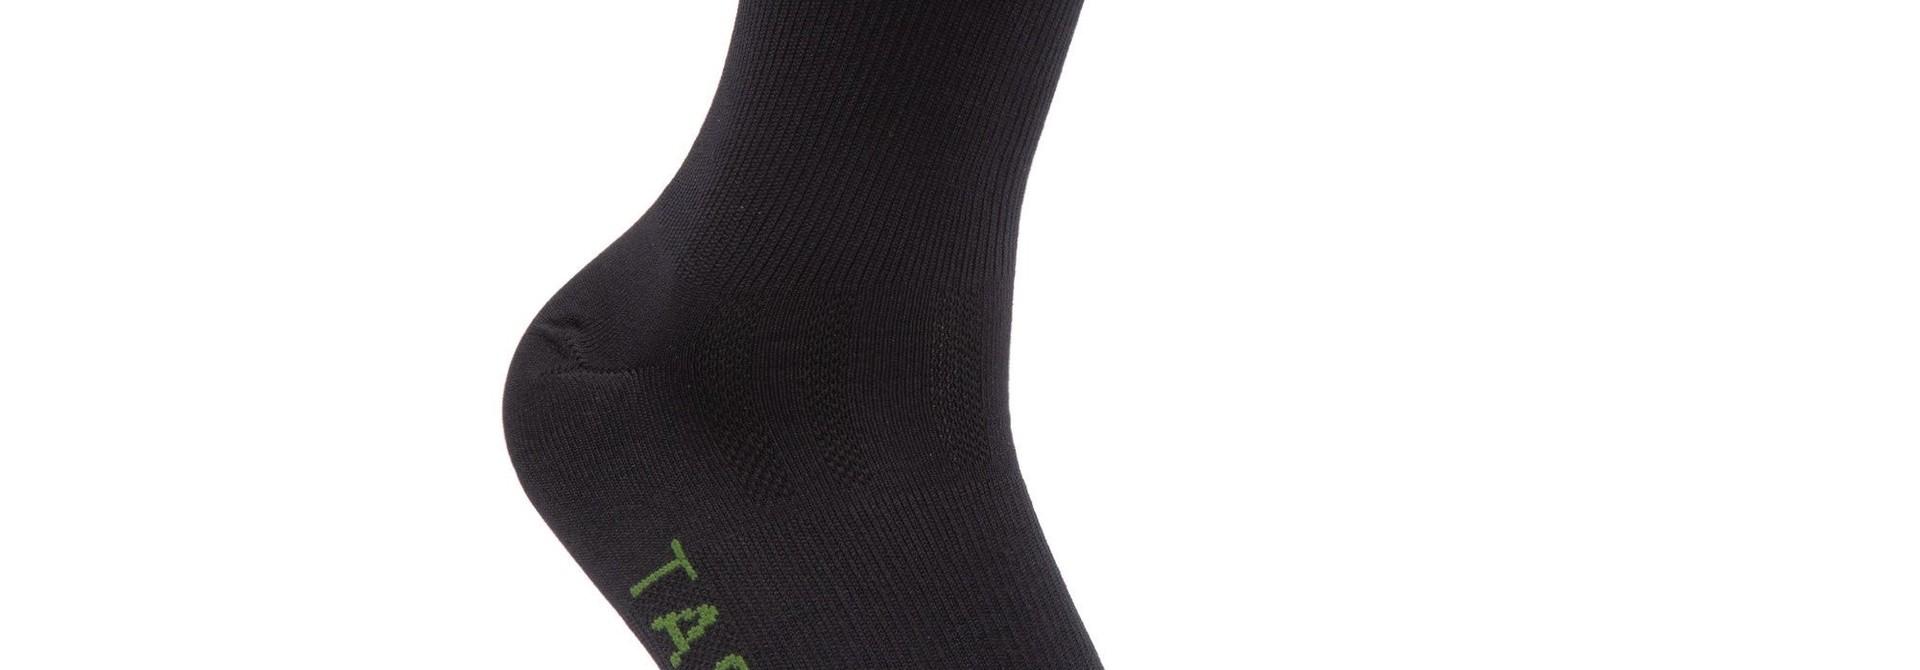 Split Double Digits MTB Socks (Olive)